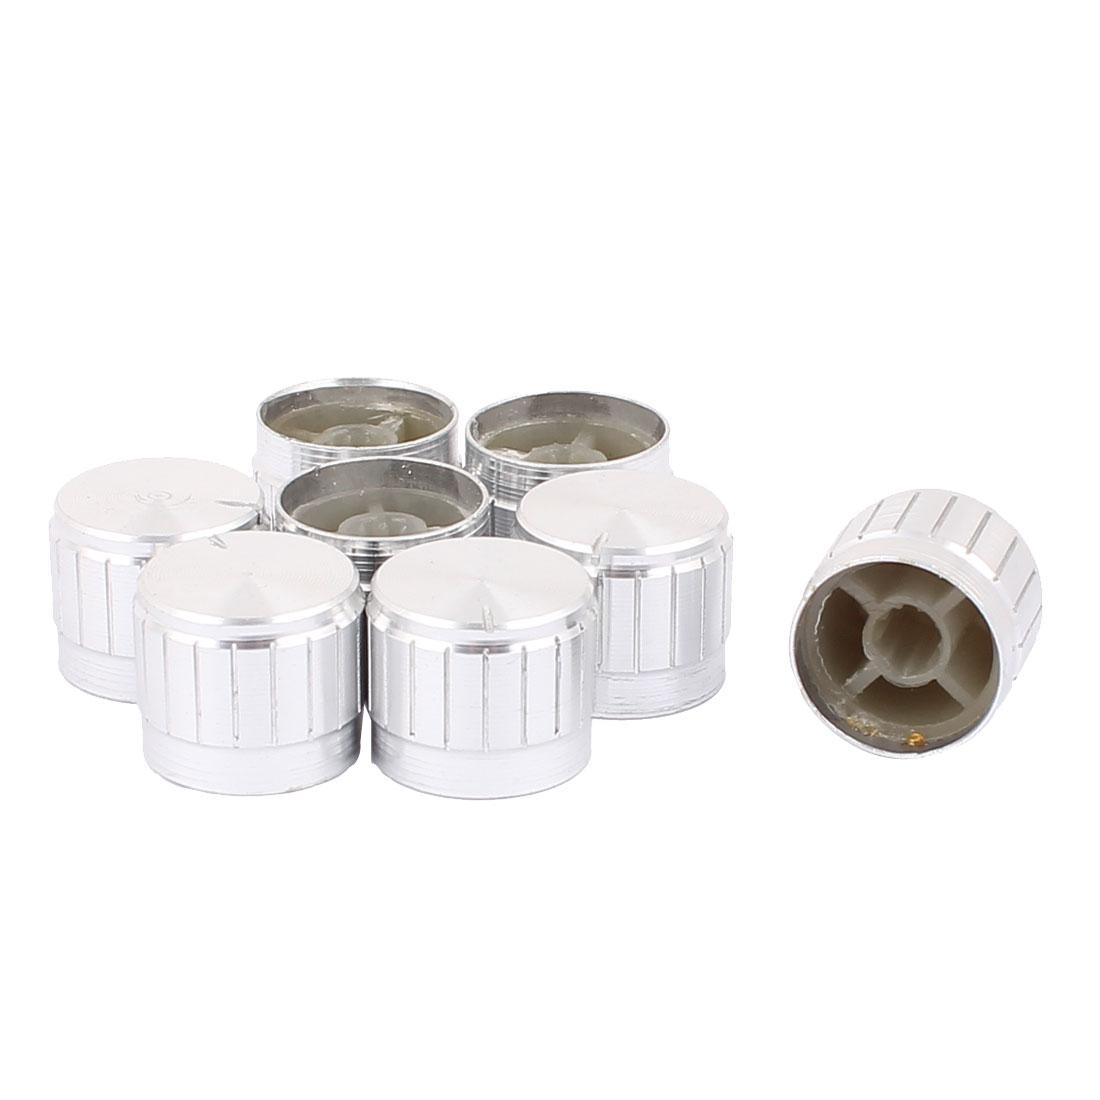 8 Pcs 21mm x 6mm Aluminium Alloy Potentiometer Control Knob Mini Cap Knurled Button Silver Tone